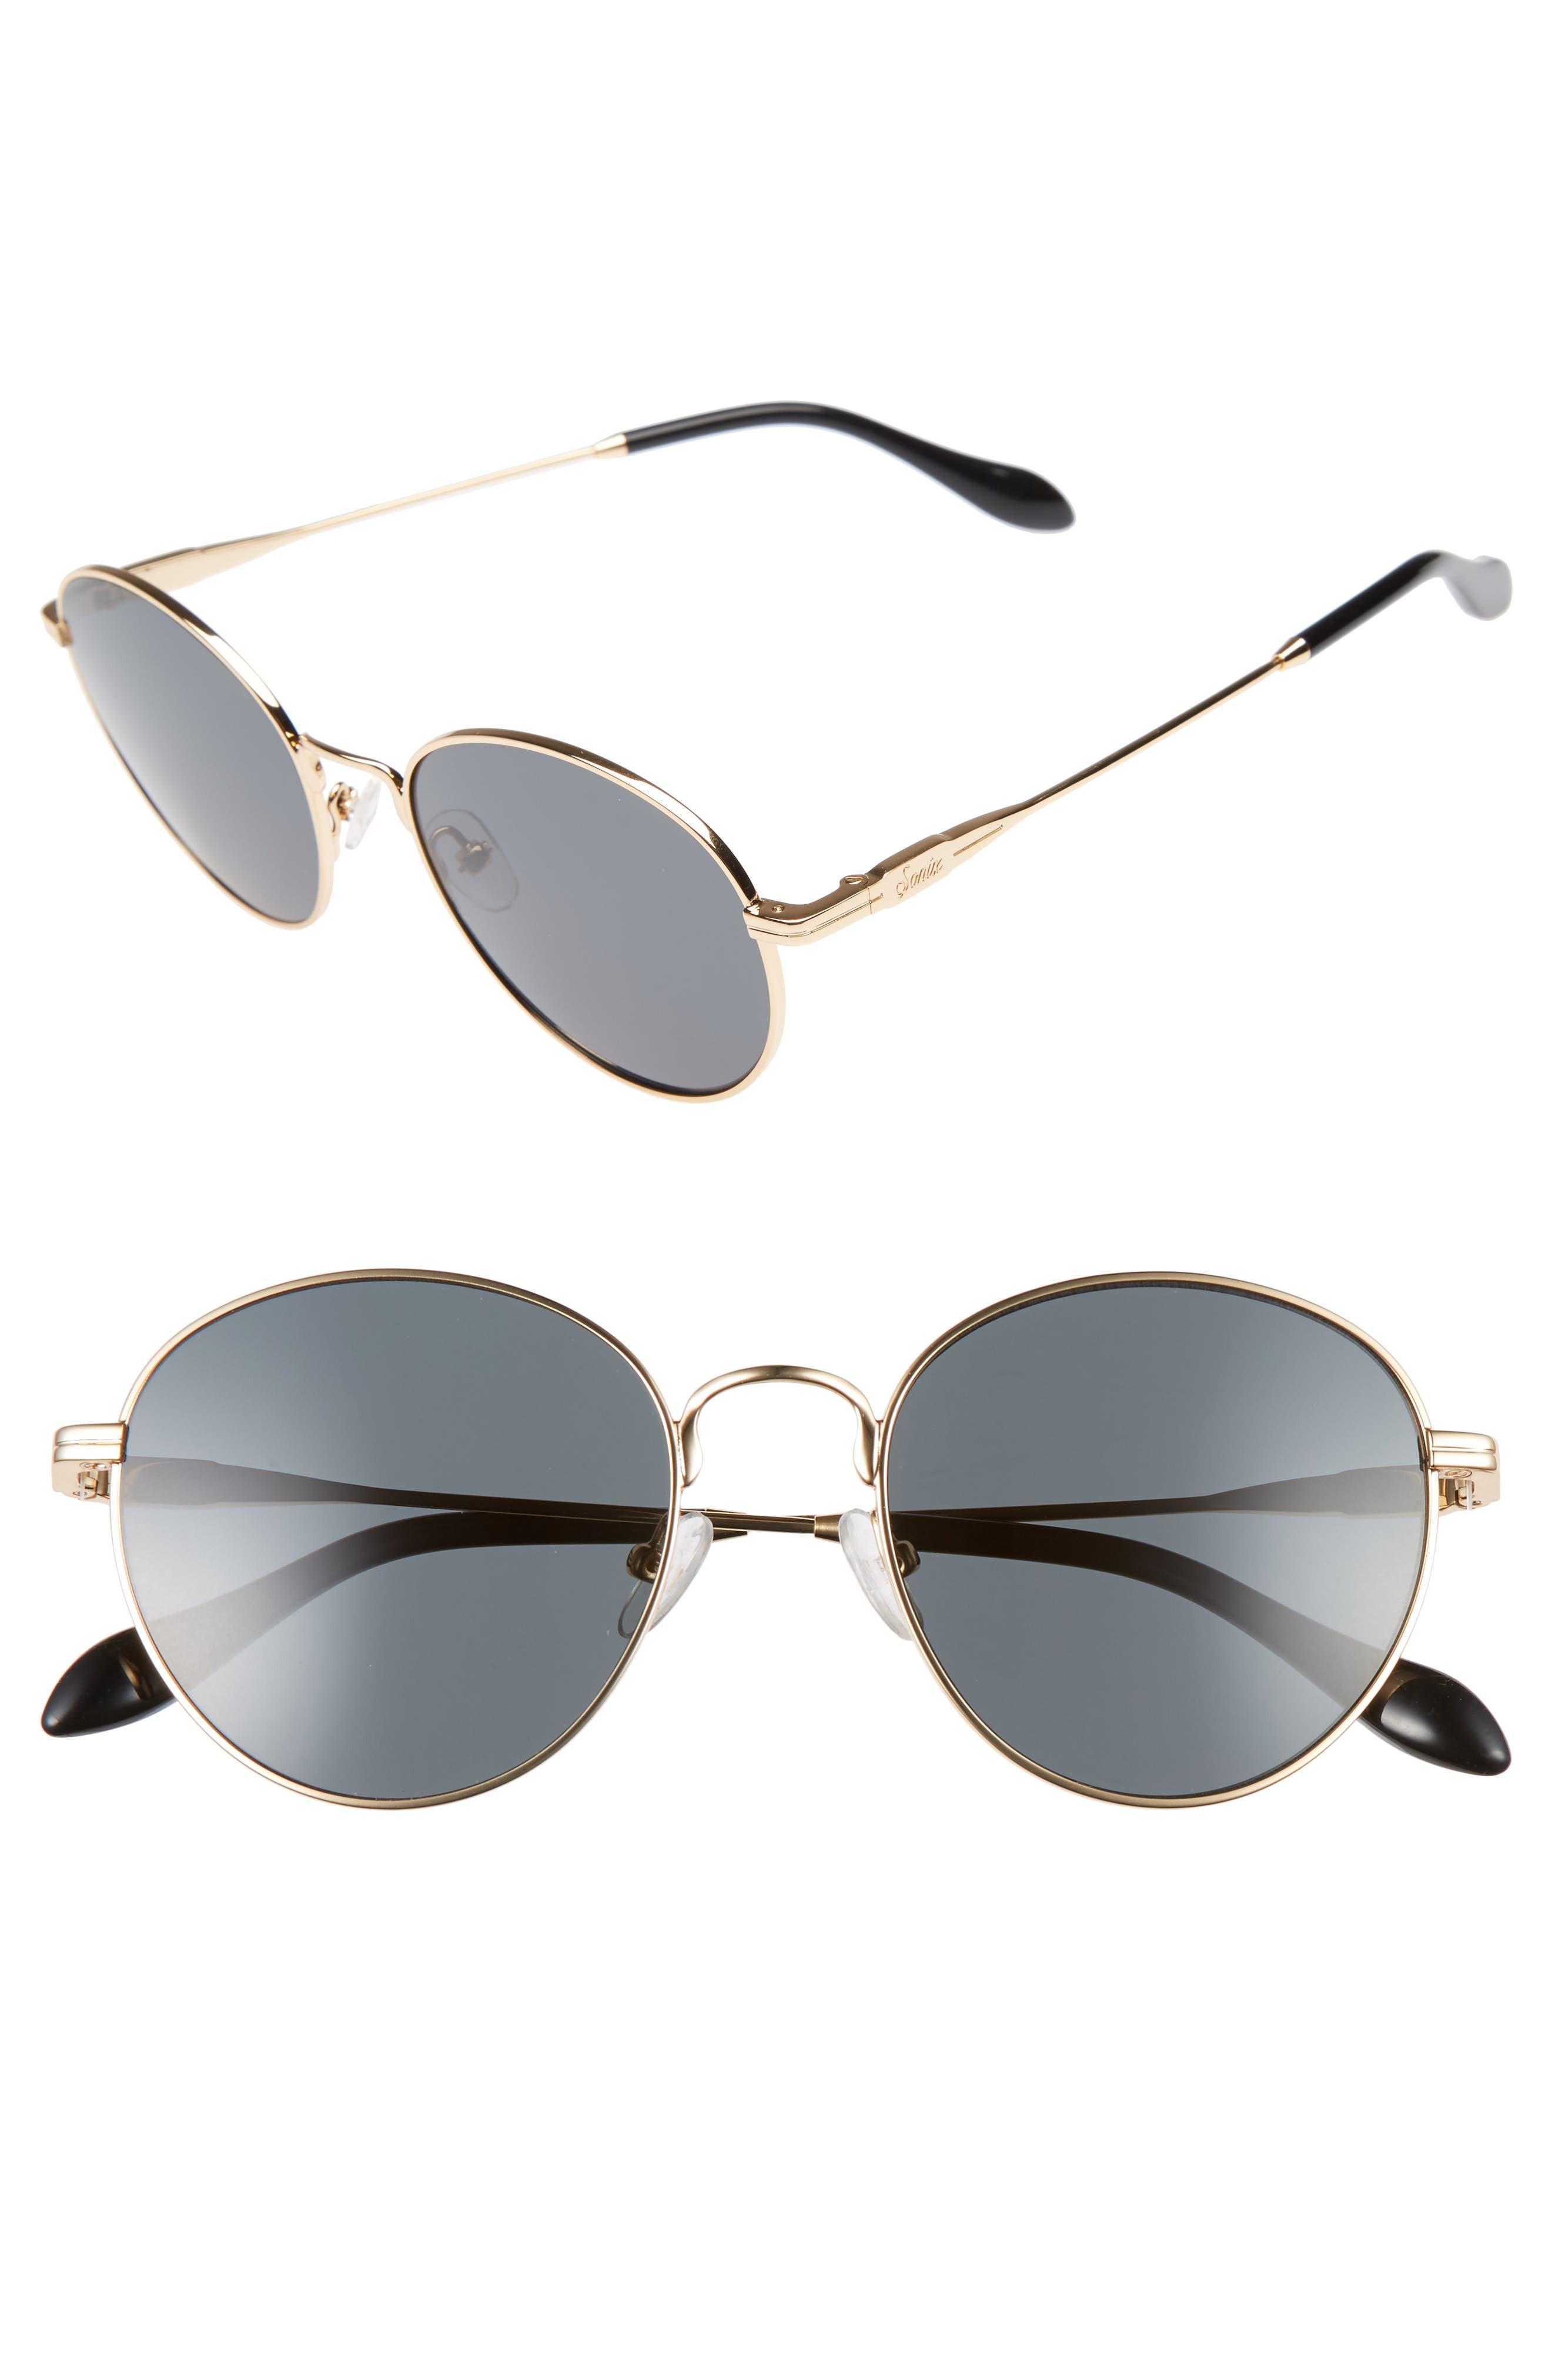 Sonix Ace 51mm Round Sunglasses